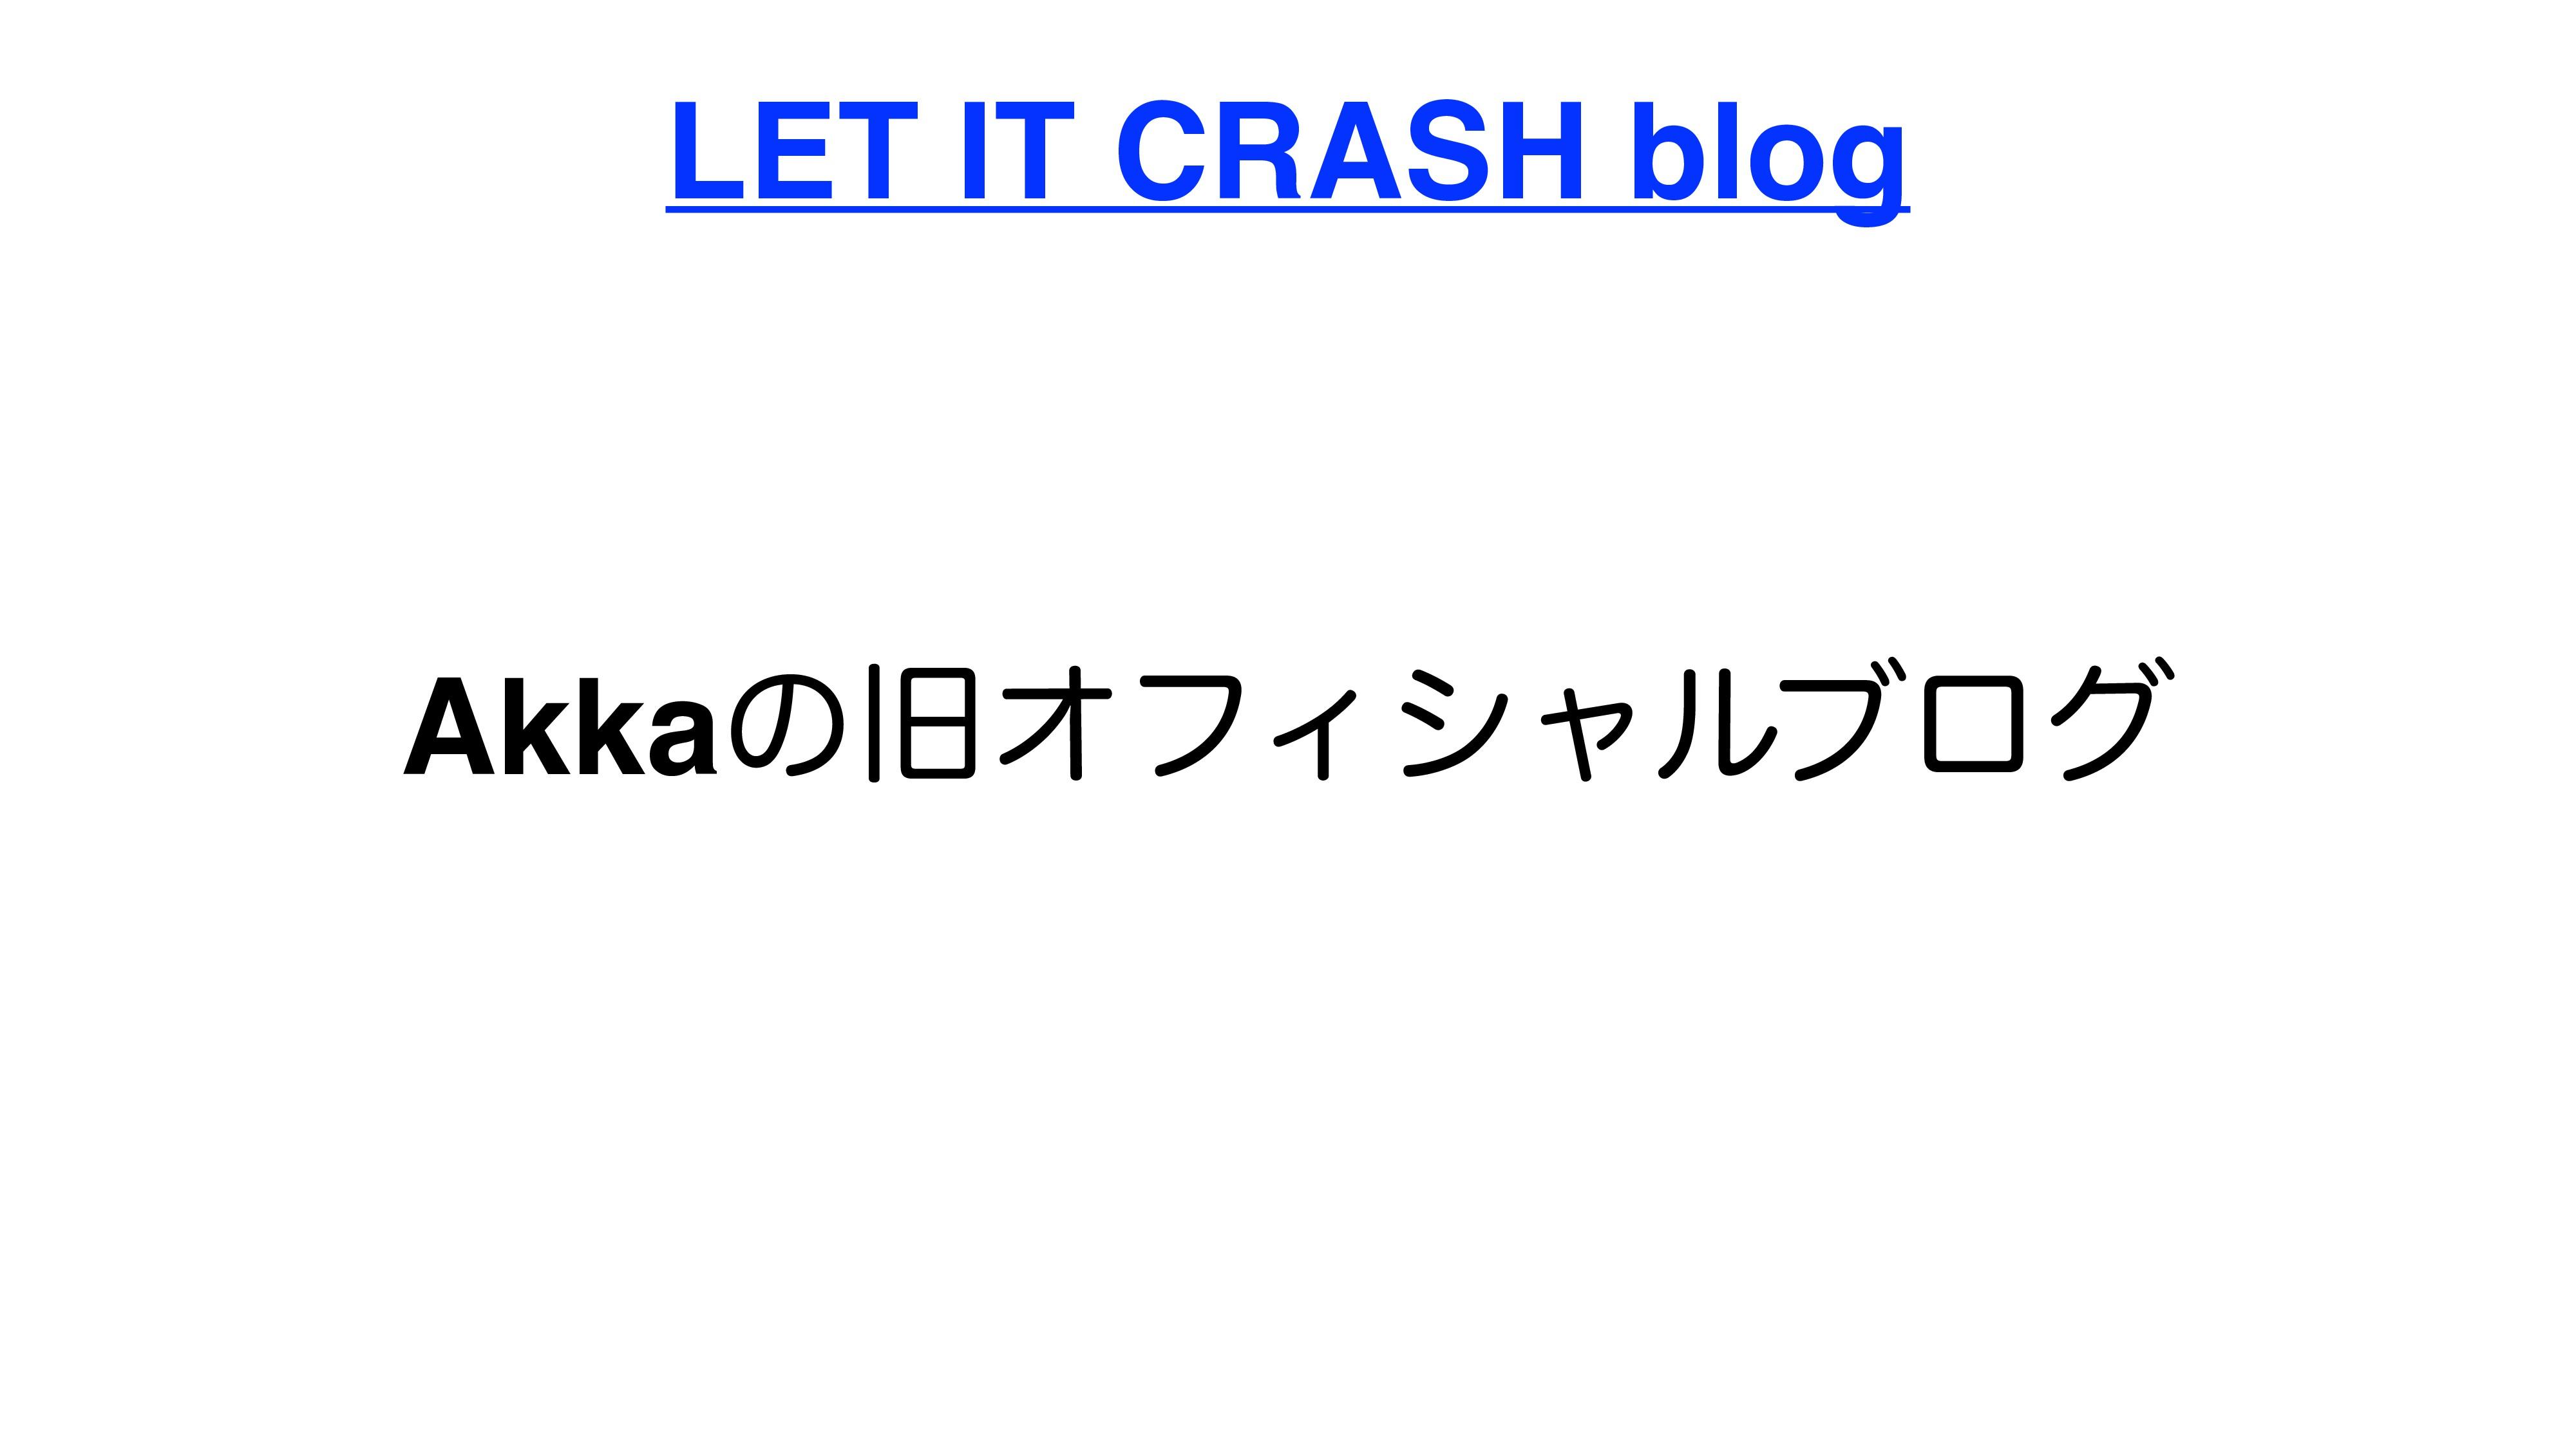 AkkaͷچΦϑΟγϟϧϒϩά LET IT CRASH blog